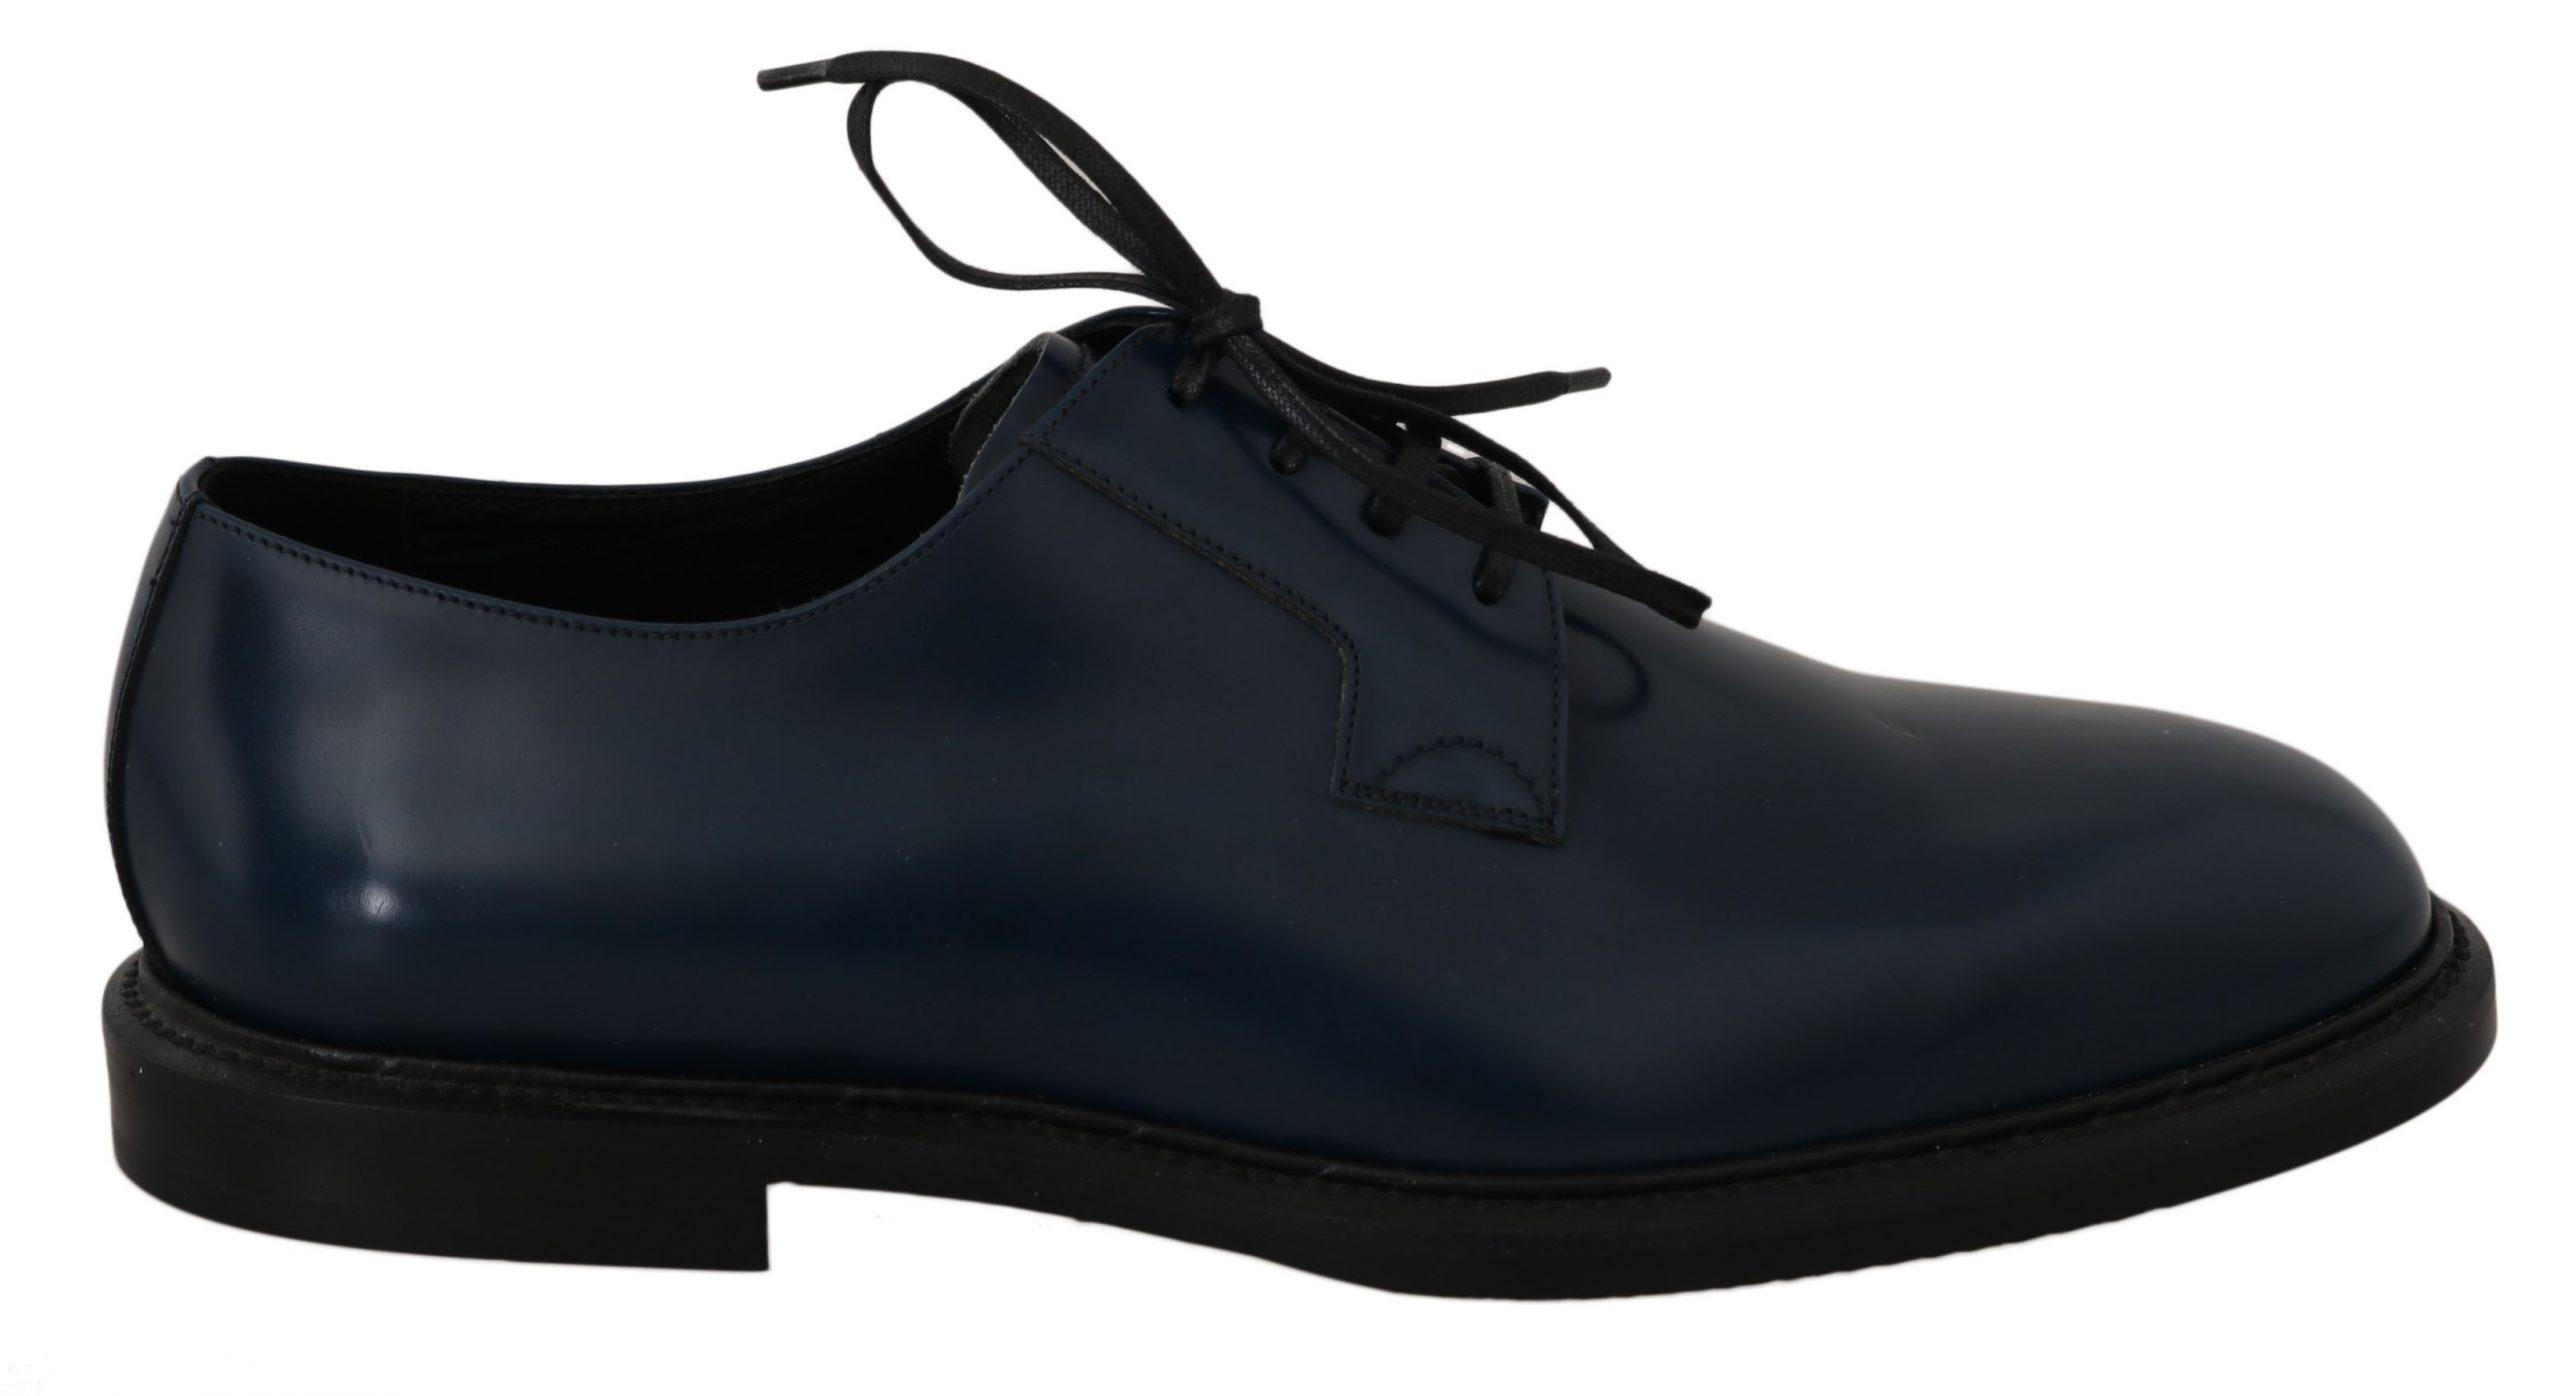 Dolce & Gabbana Men's Shoes Blue MV2347 - EU43/US10